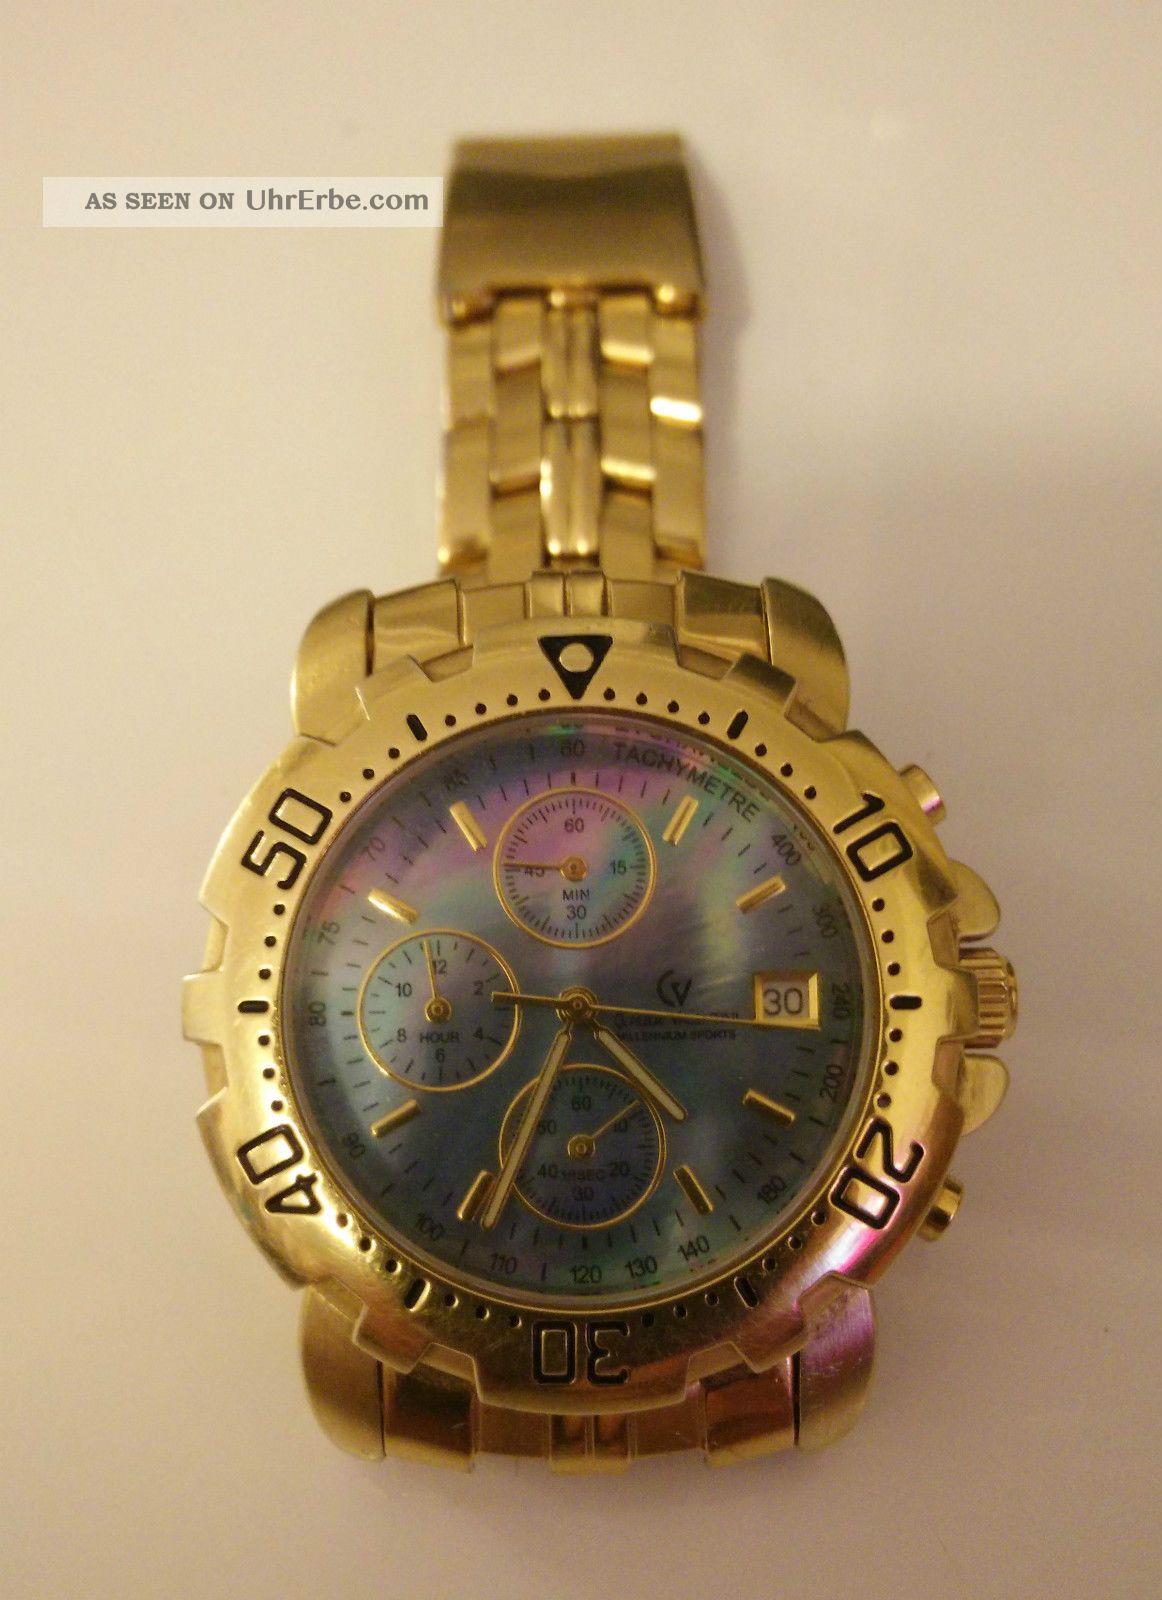 Claude Valentini Uhr Chronograph 18 Karat Platiert Vergoldet Goldummantellung Armbanduhren Bild